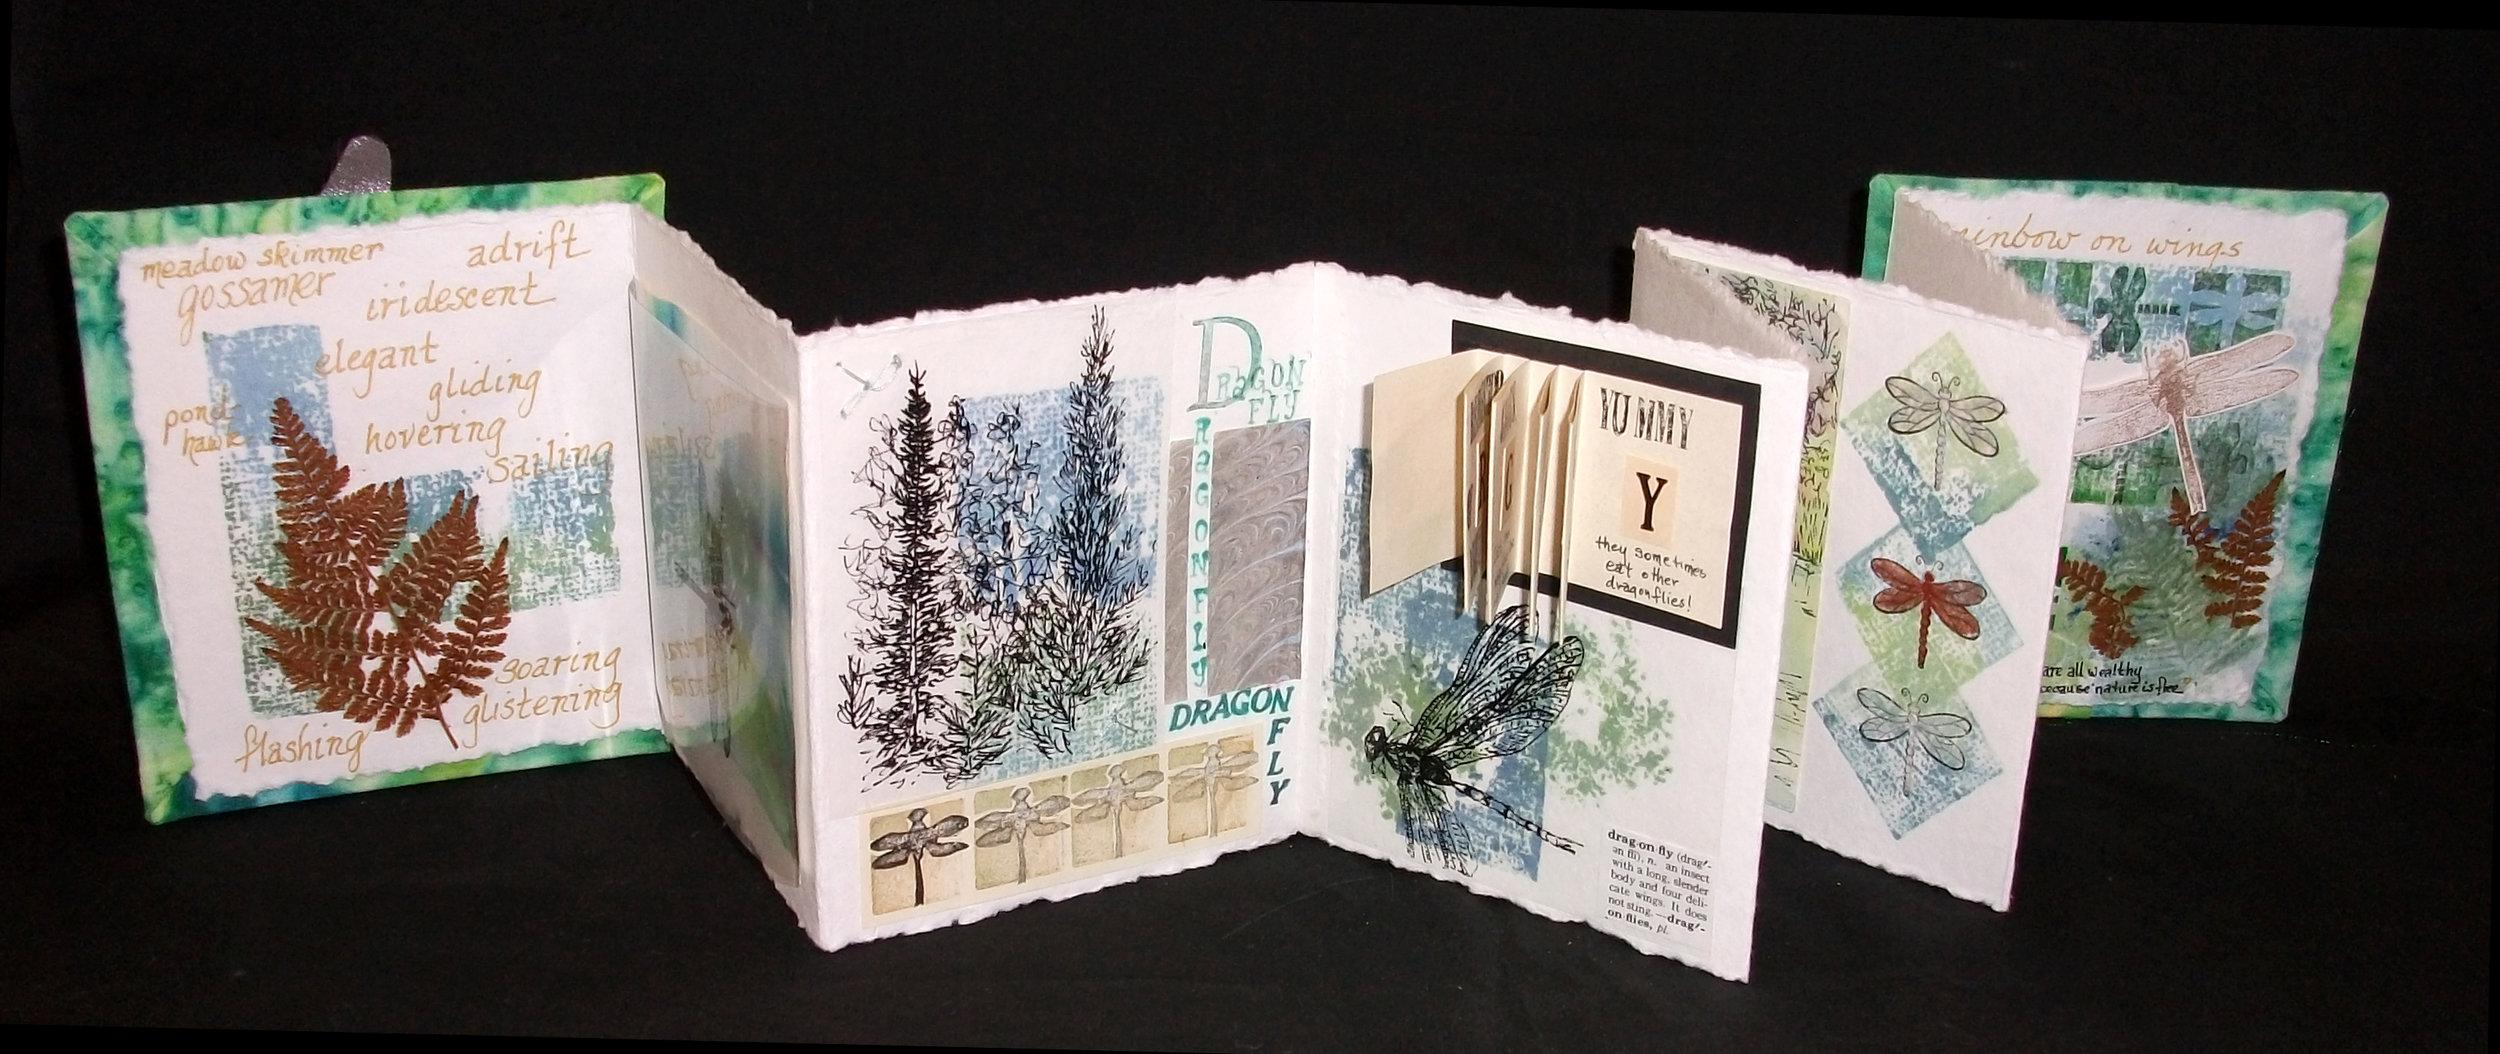 Dragonfly, Marty Schneider, Mixed Medium, New York, 2006